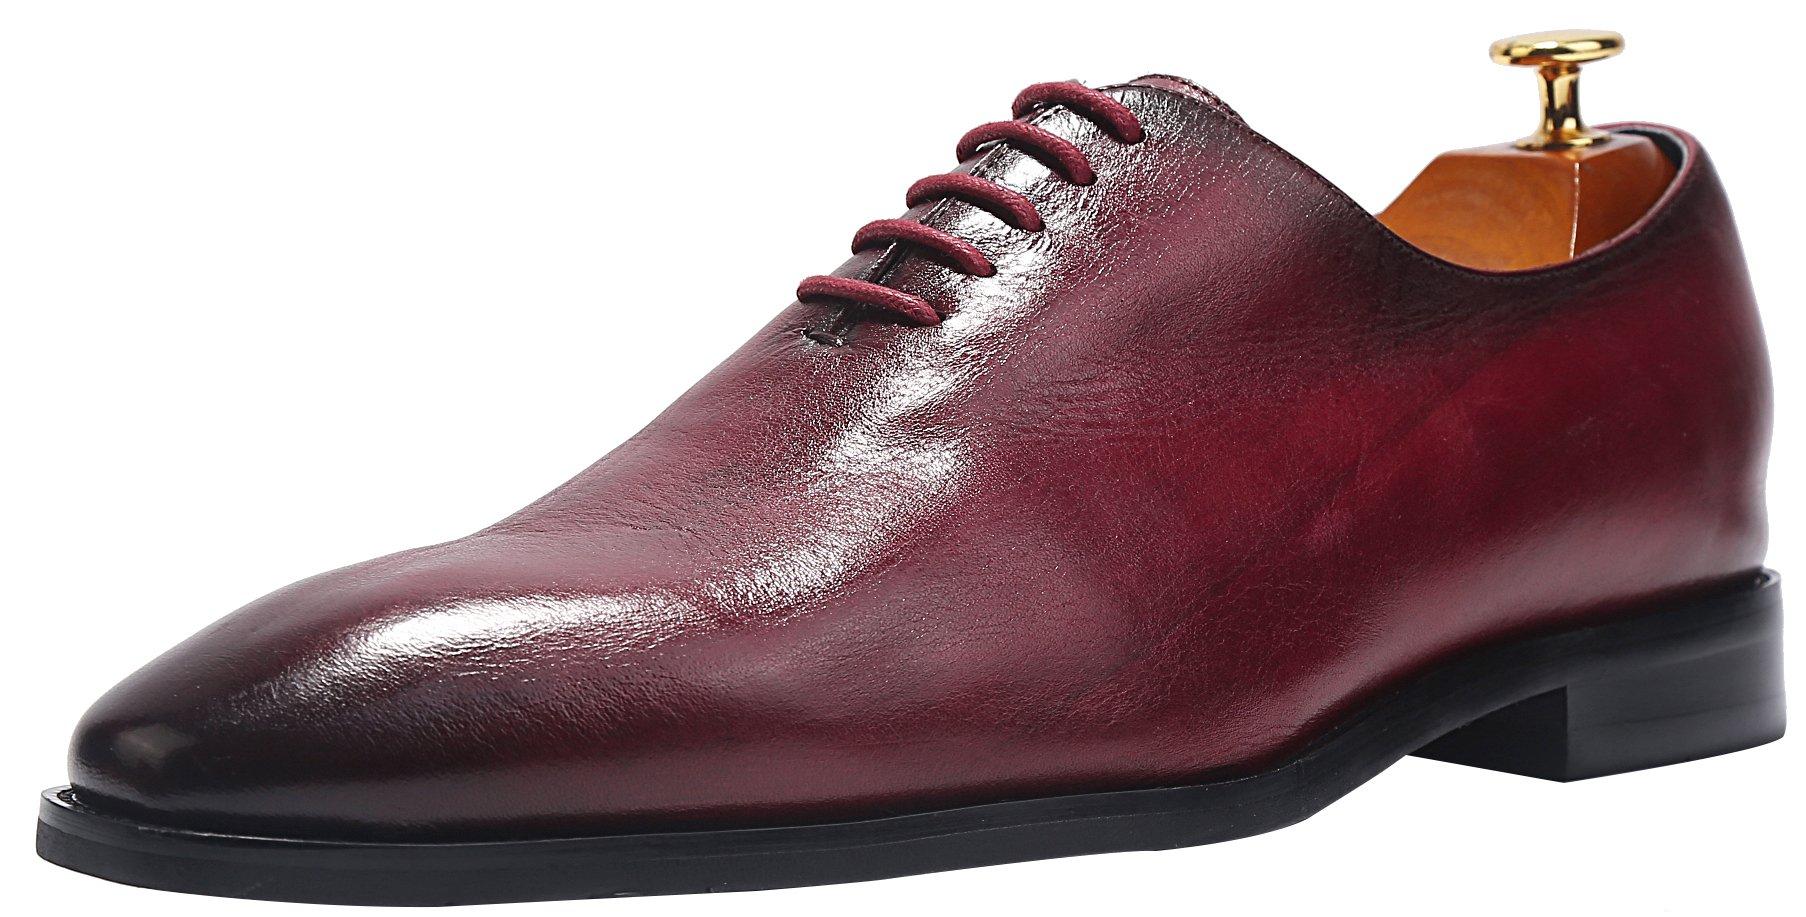 ELANROMAN Men's Business Dress Derby Shoes Retro Classic Italian Handmade Oxford Shoes Red(US 10 EU 44 Foot Length 309.32mm)